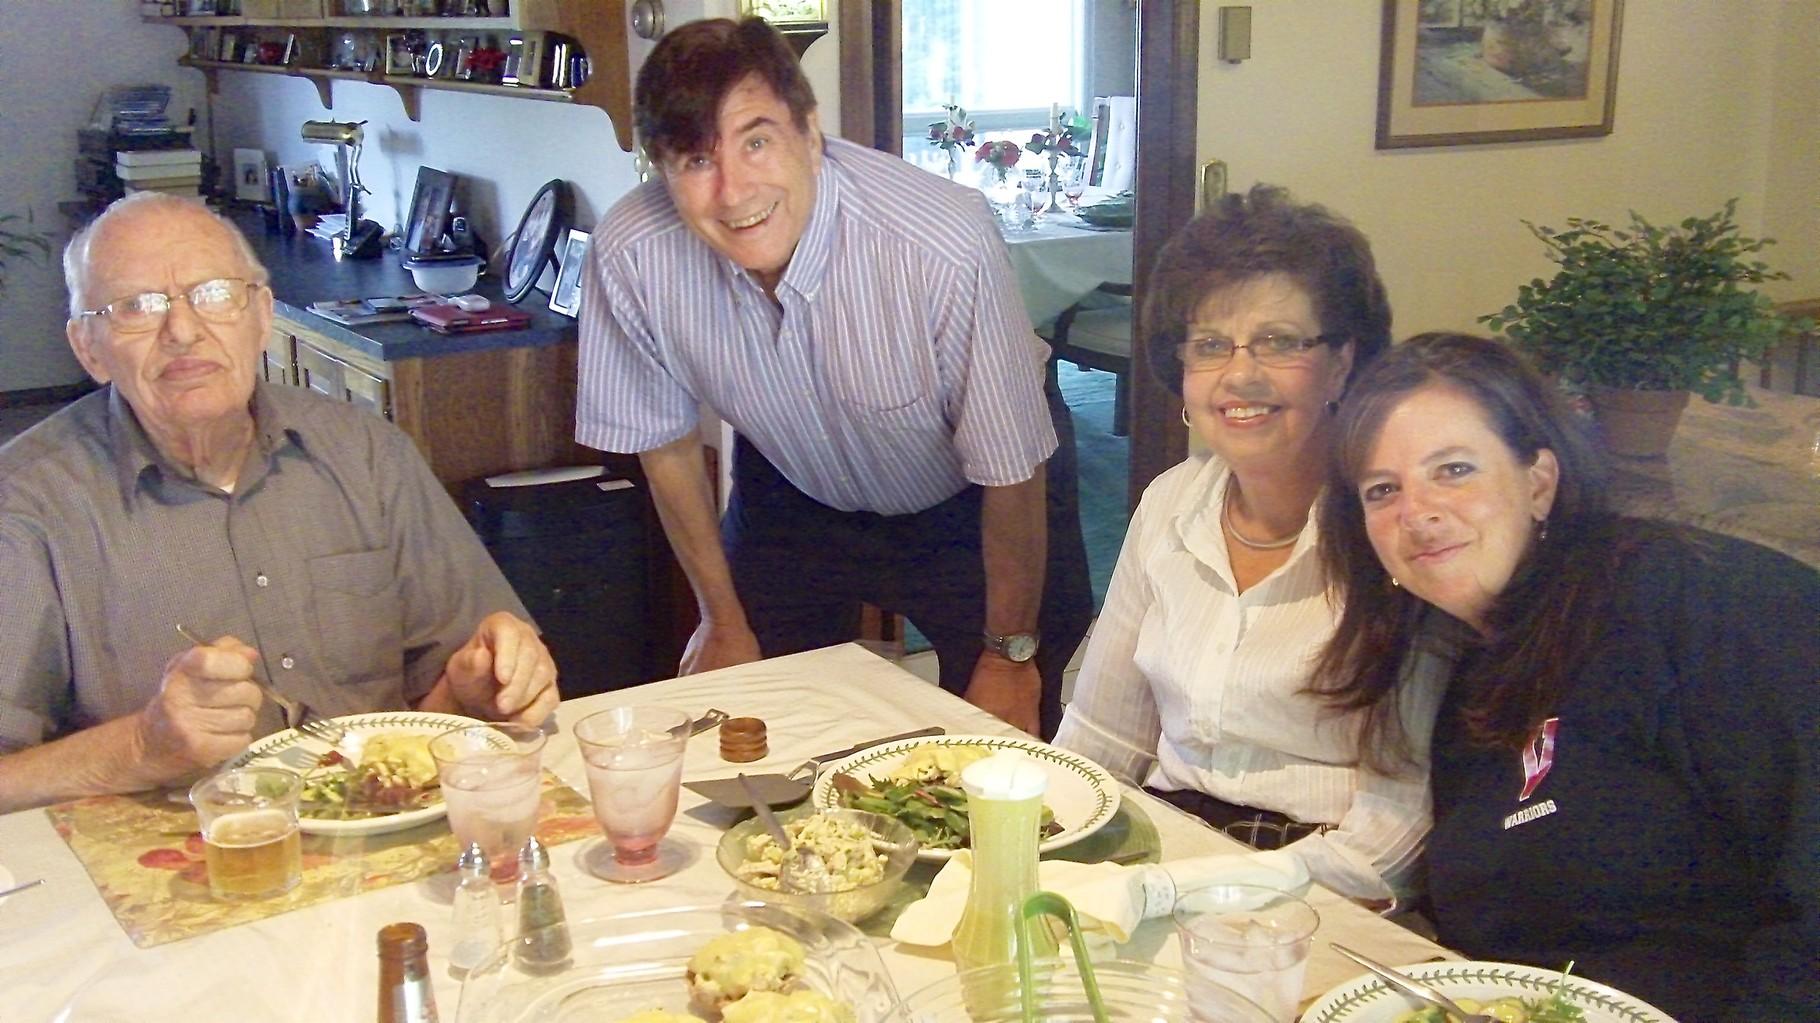 Lou Longo, John, Kathy, and Cindy